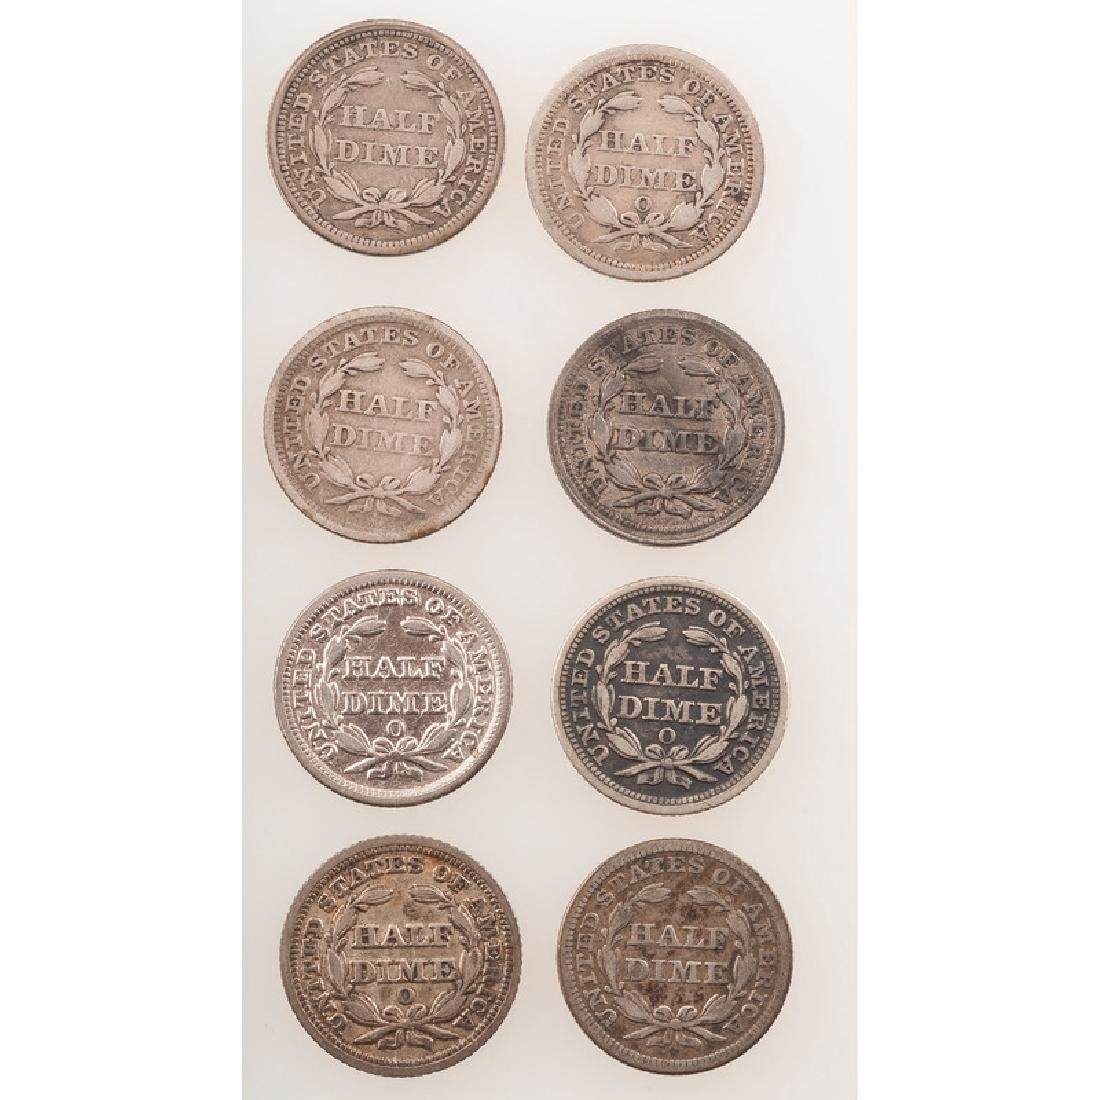 United States Liberty Seated Half Dimes 1851-1854 - 2